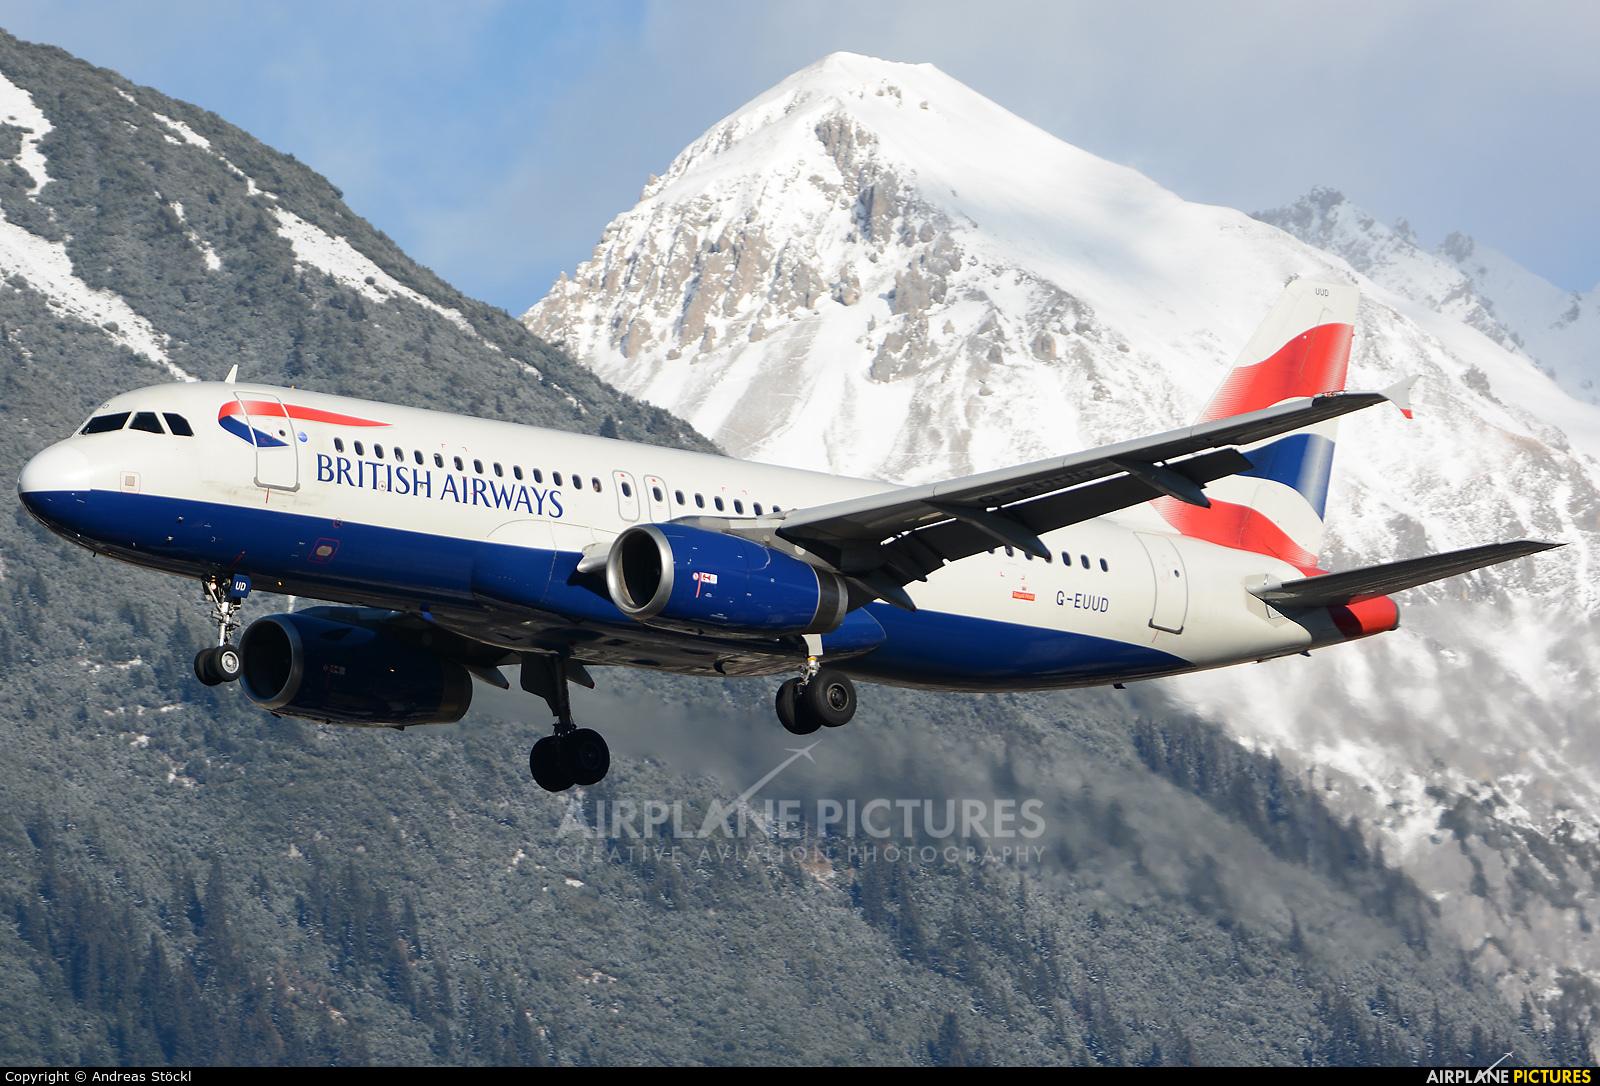 British Airways G-EUUD aircraft at Innsbruck